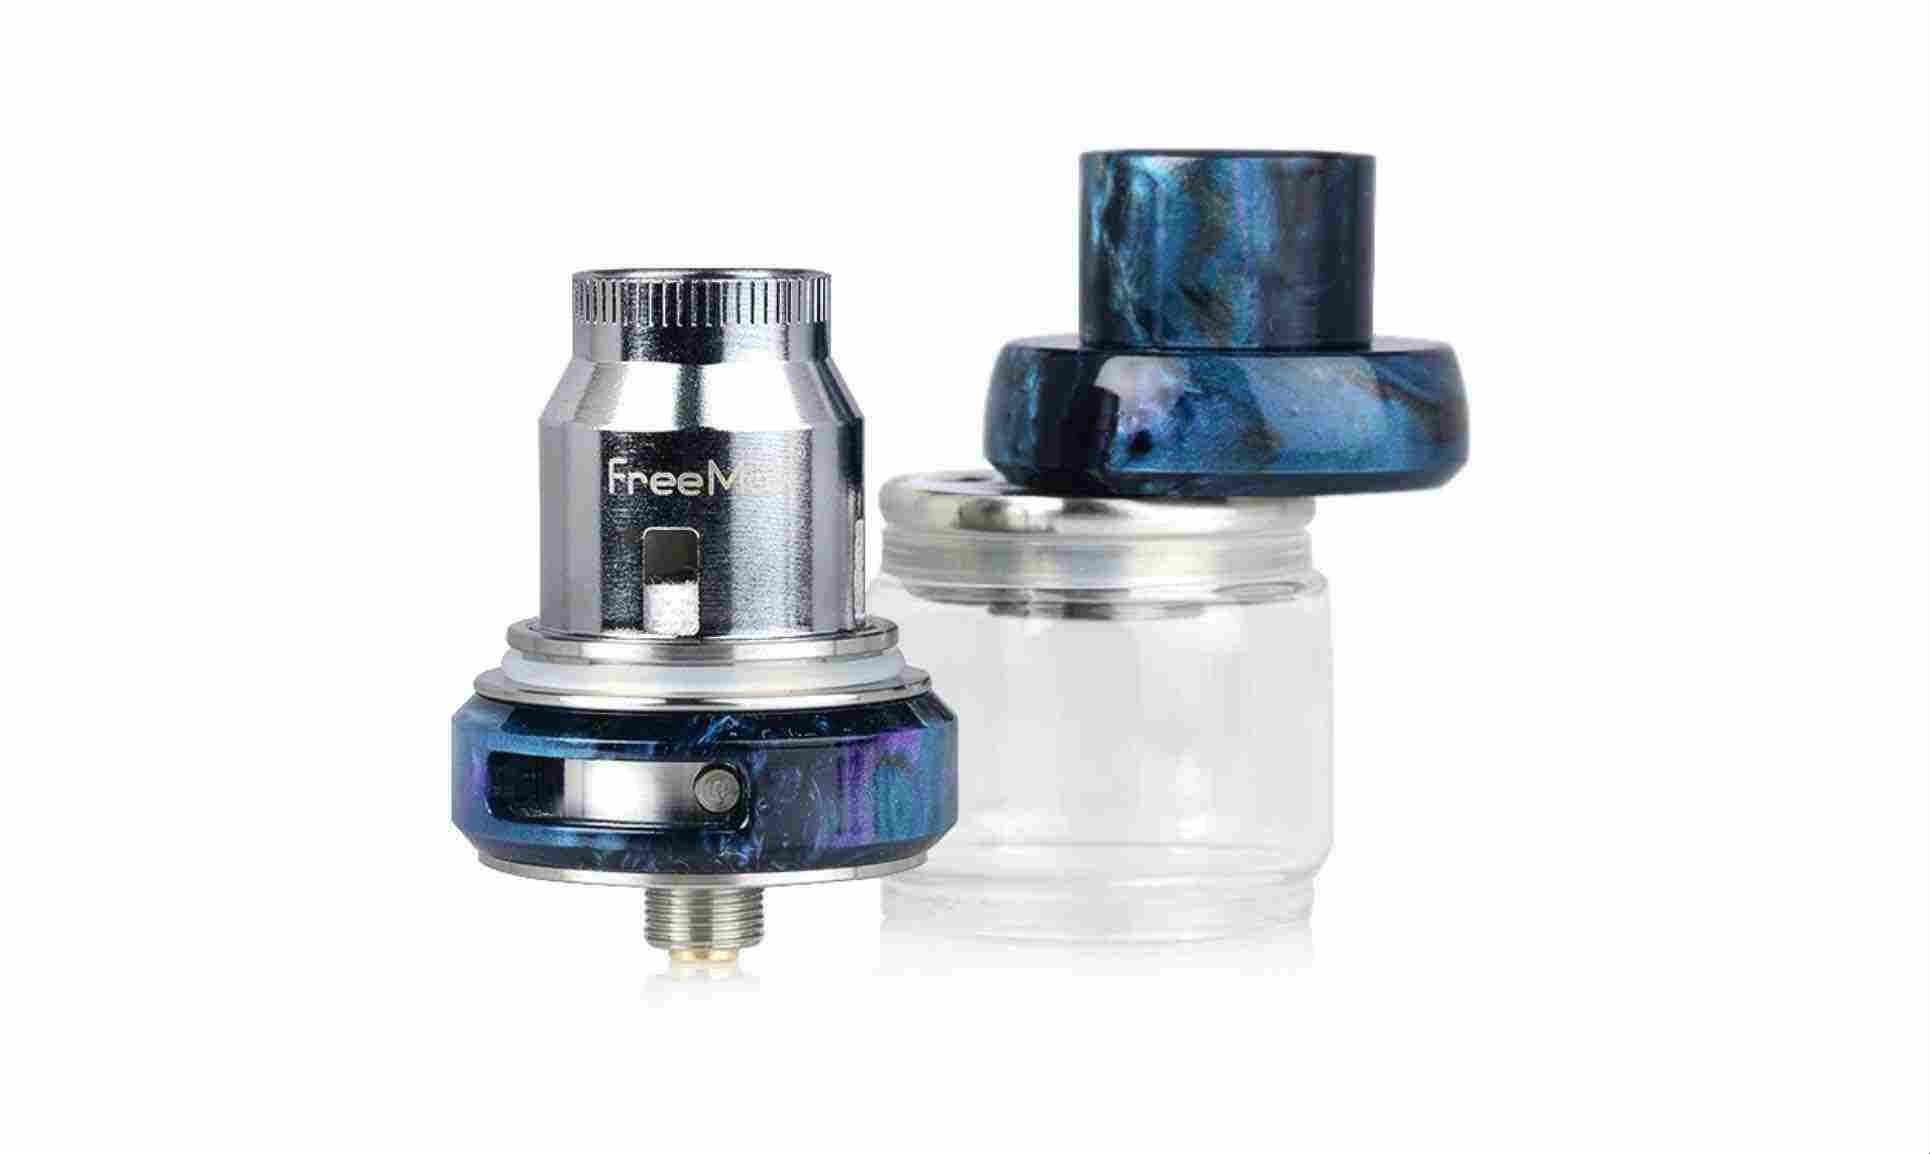 freemax-mesh-pro-sub-ohm-tank-coil-image